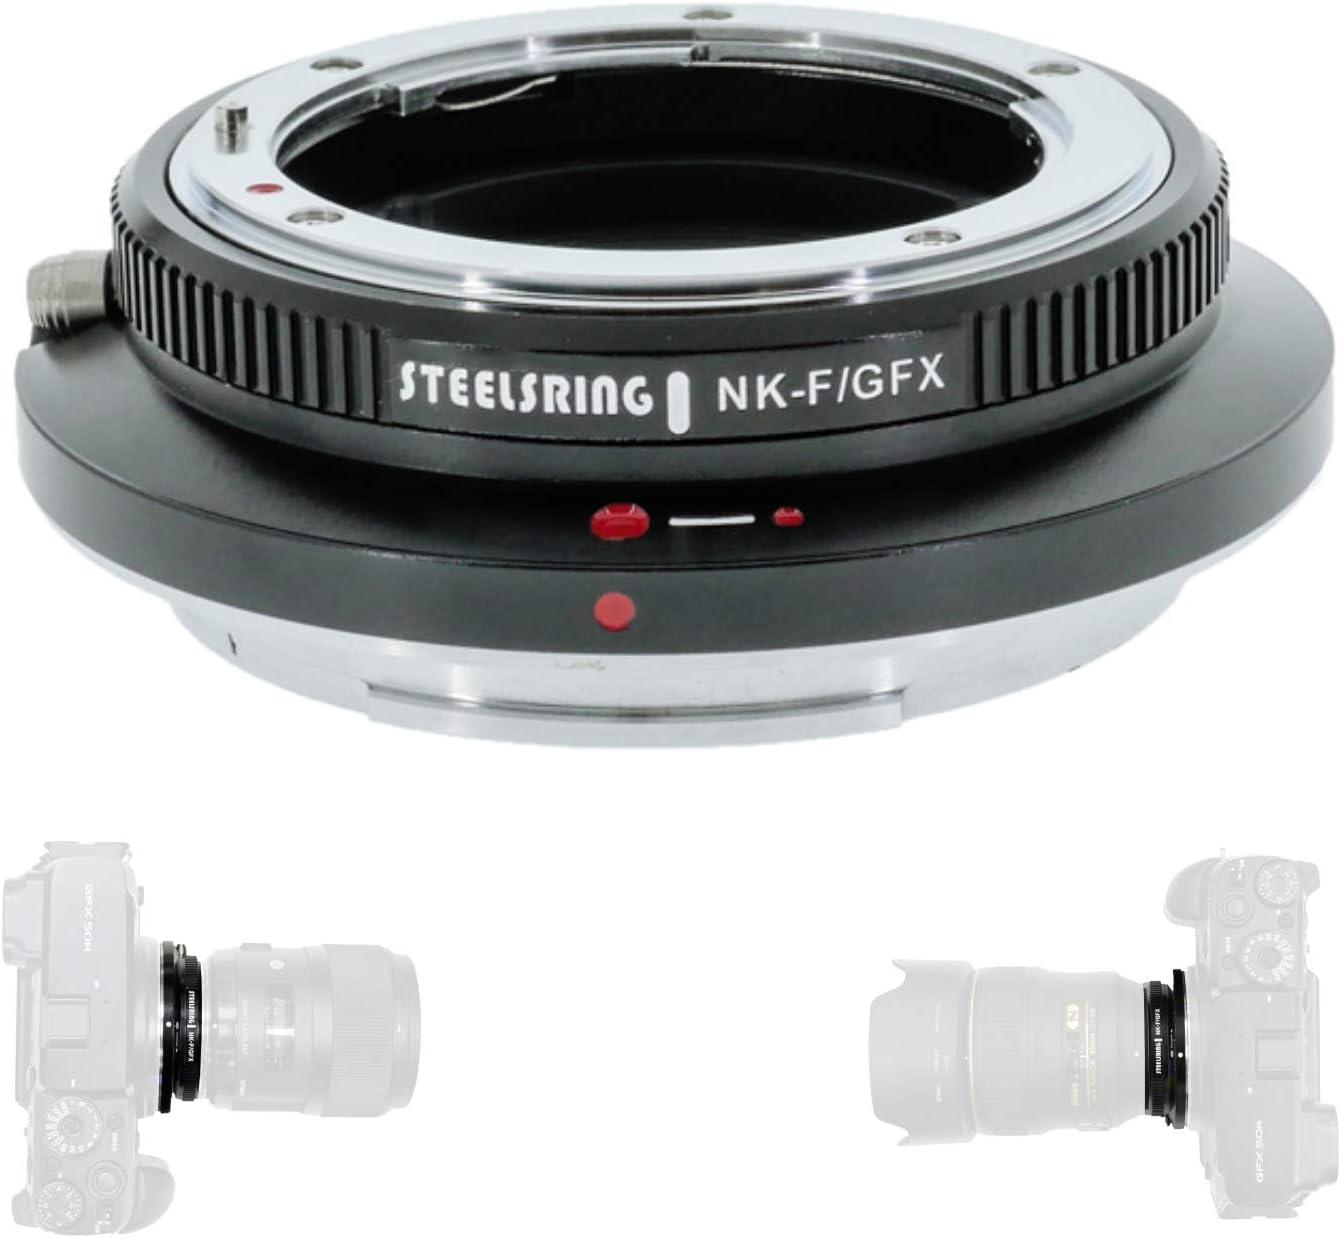 Steelsring Nk F Gfx Auto Focus Adapter Ring Lens Camera Photo